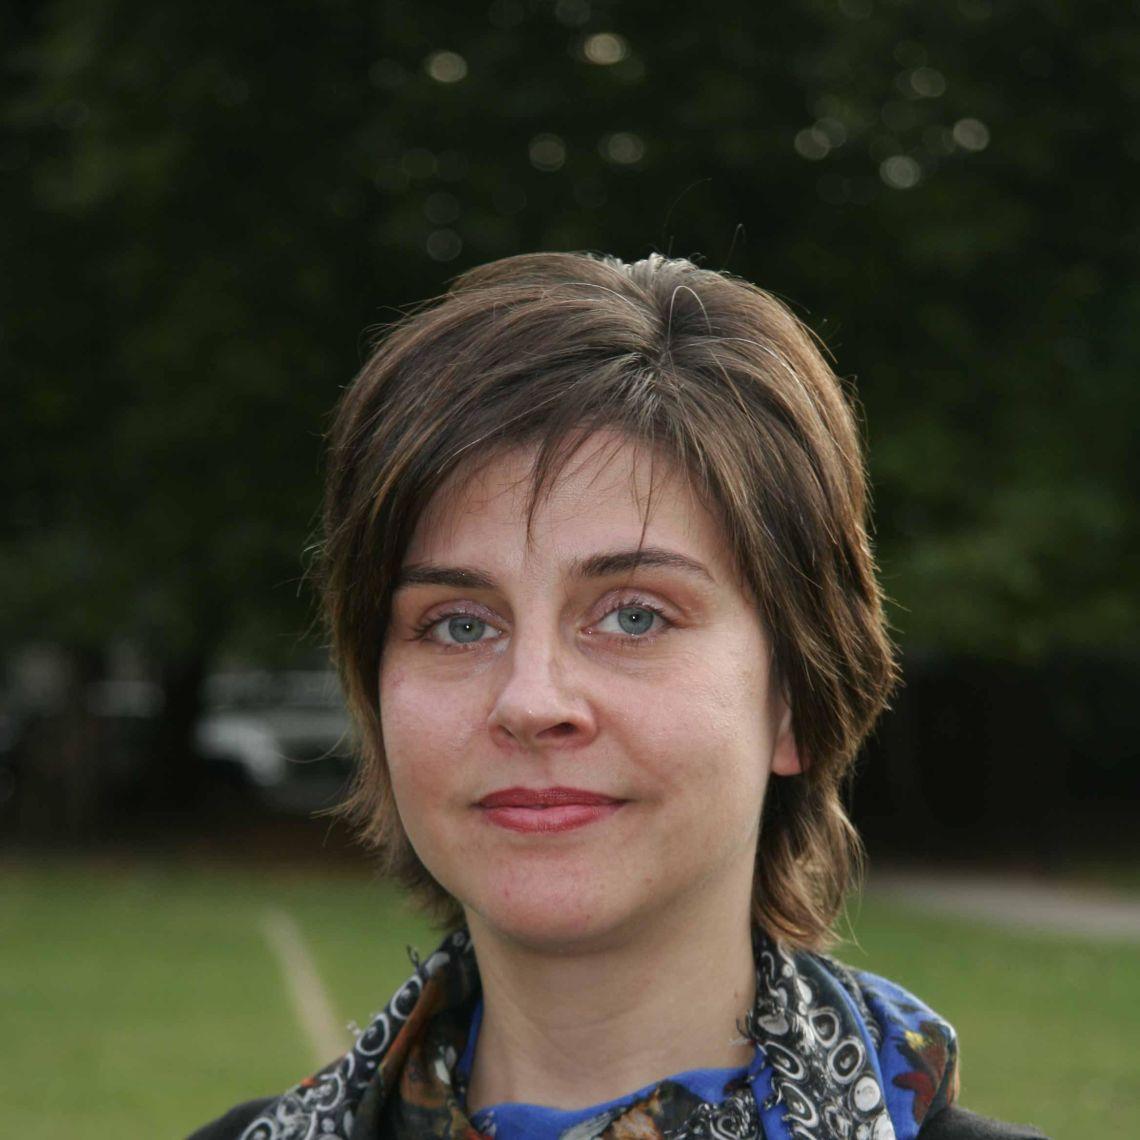 Nicola Ternette